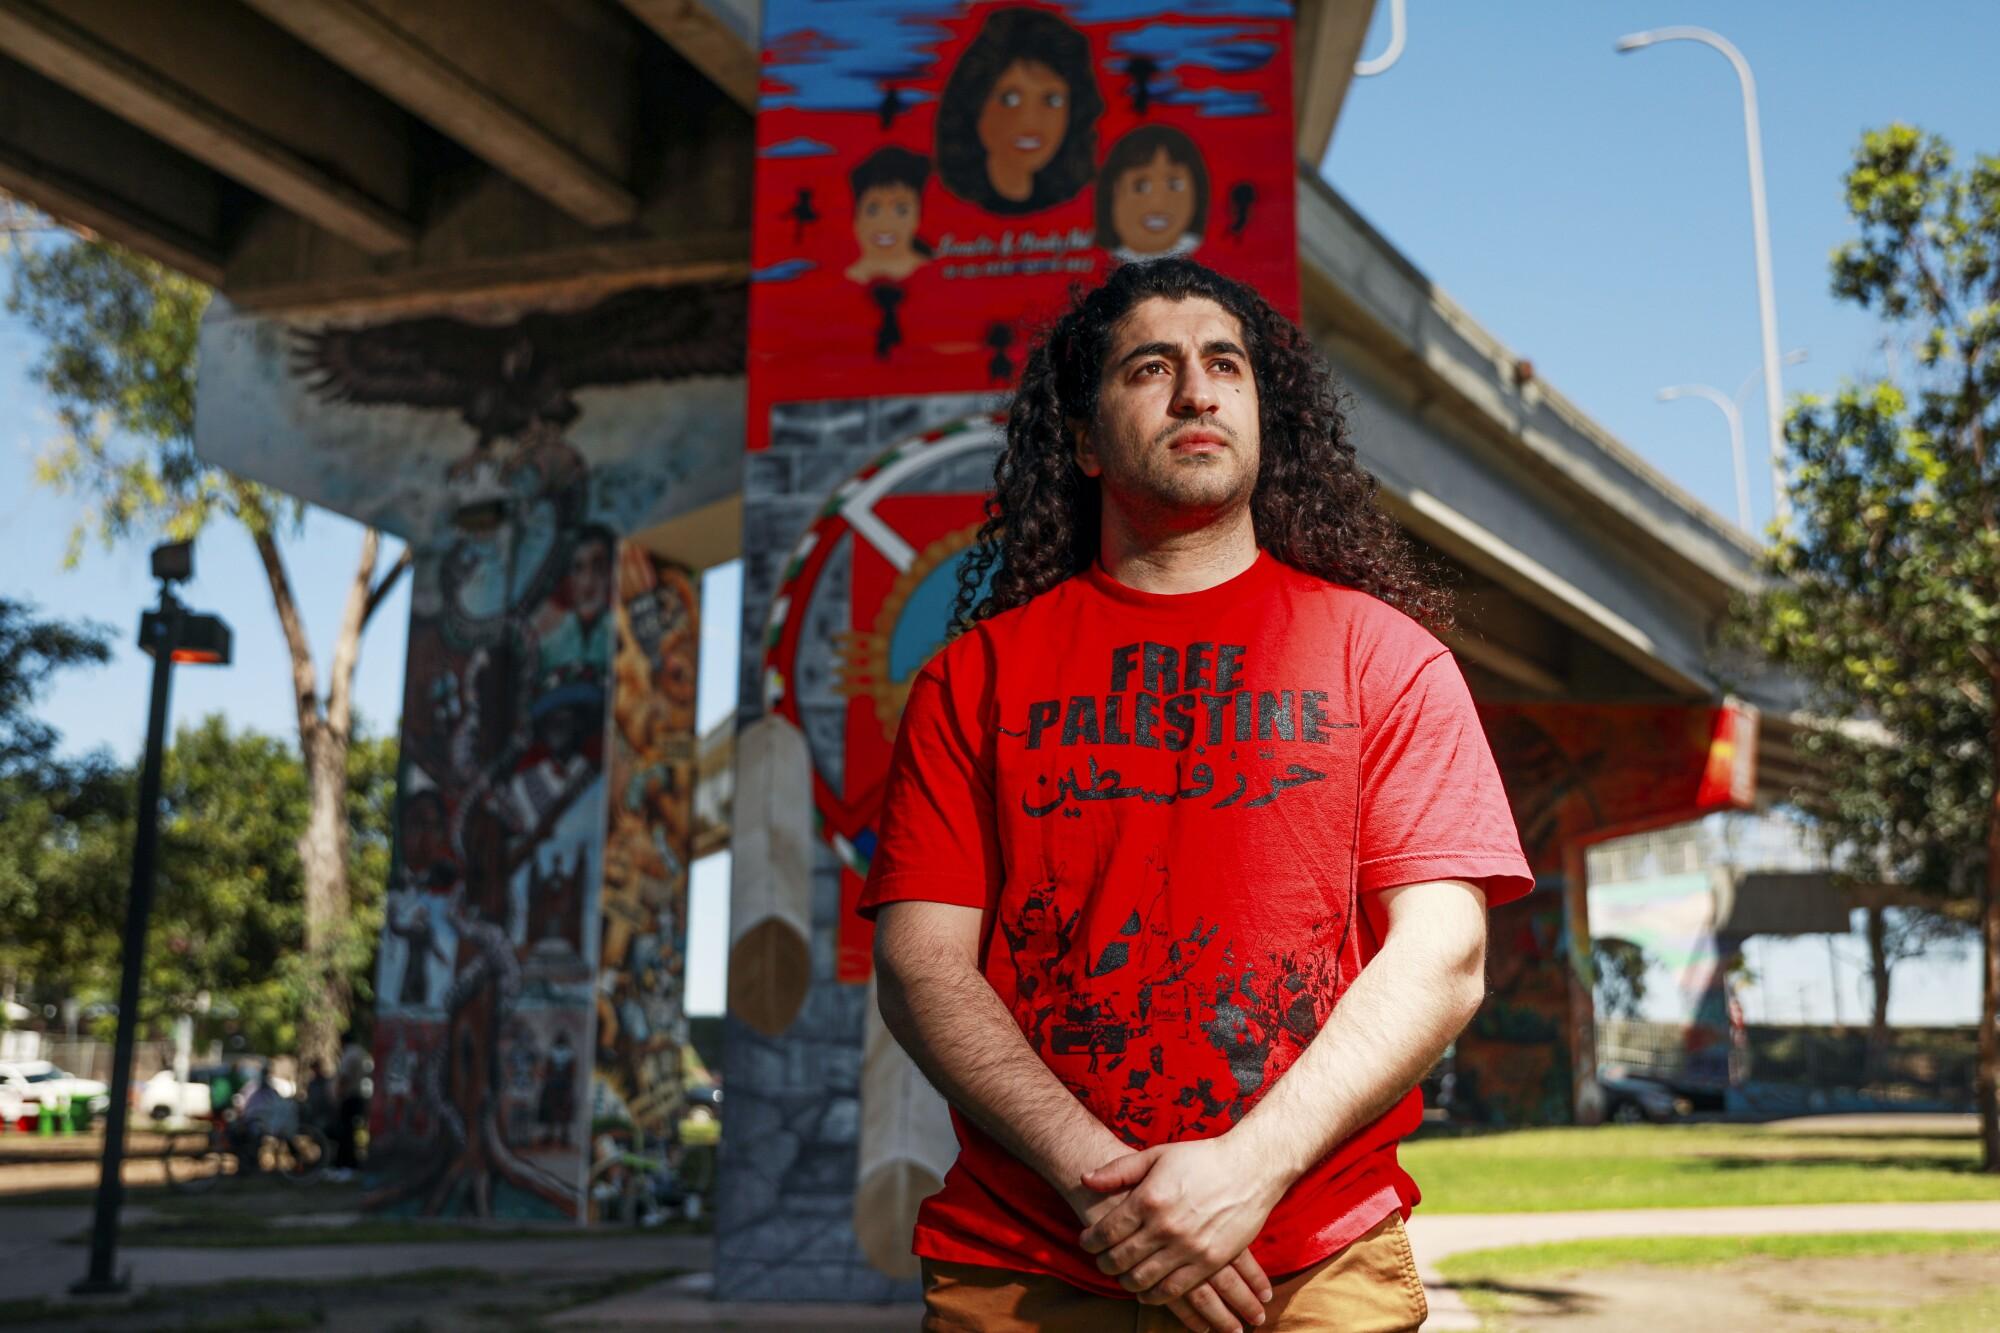 Ali-Reza Torabi stands in San Diego's Chicano Park